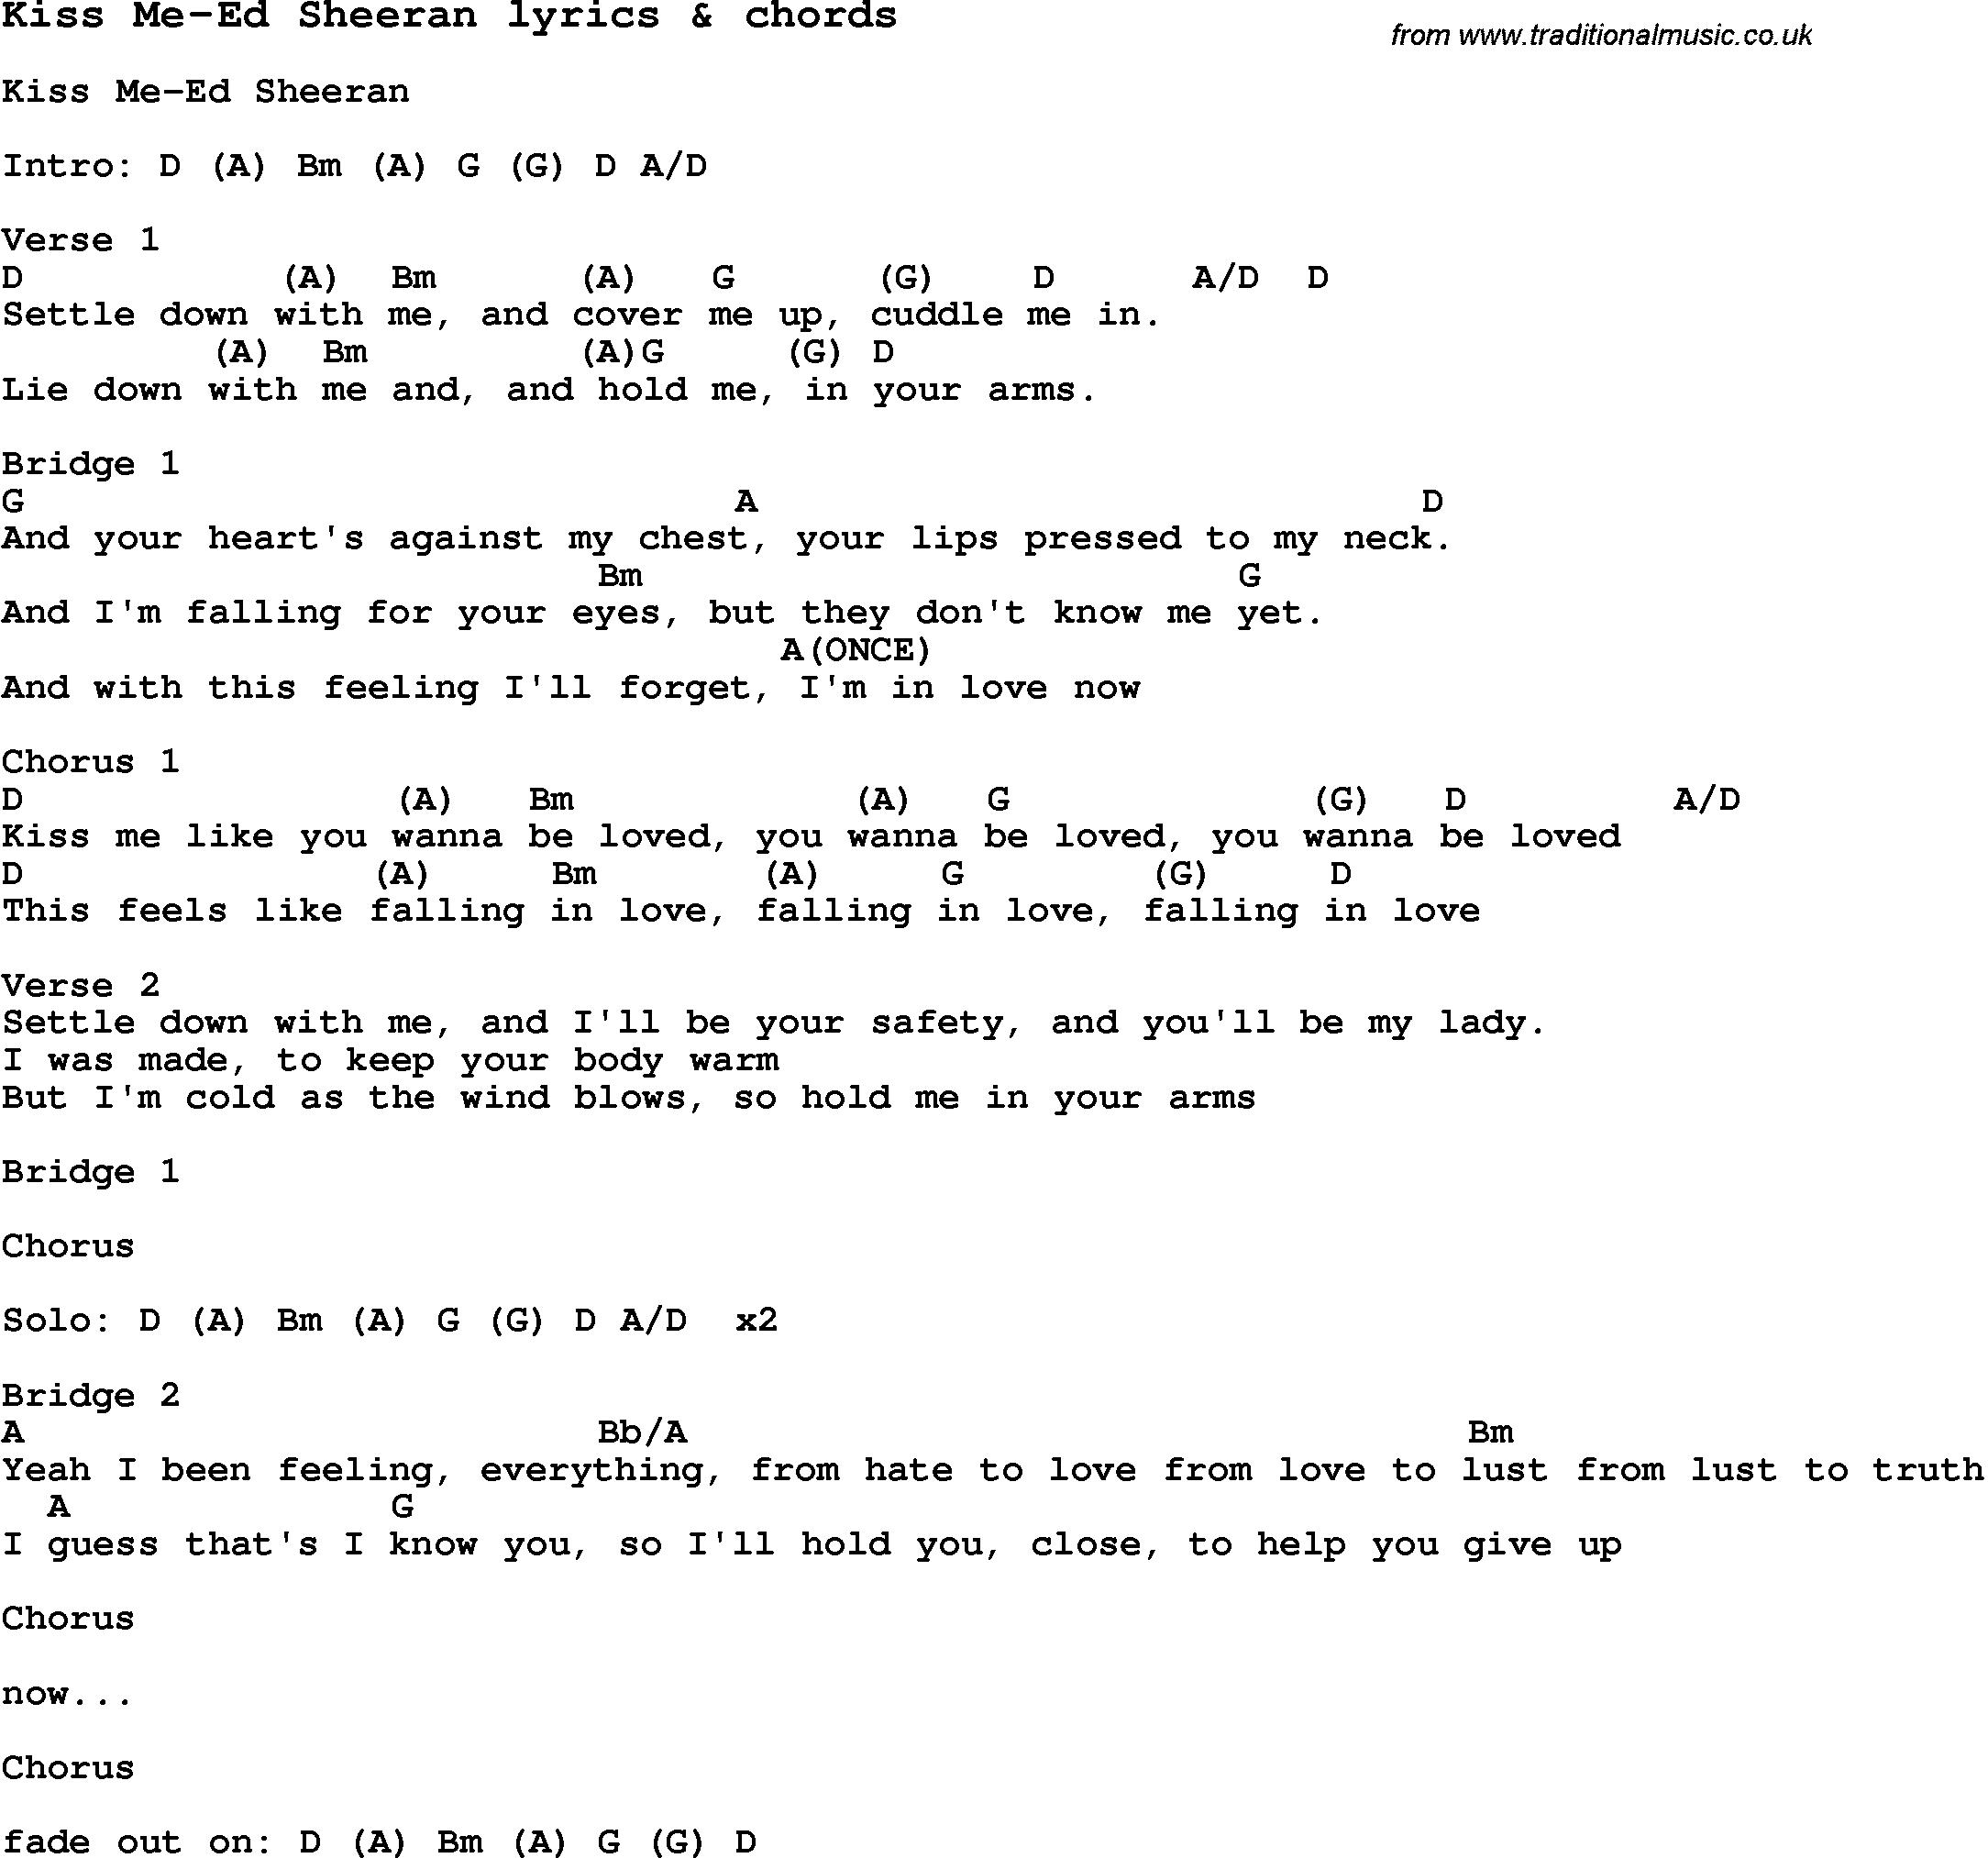 Ed Sheeran Chords Love Song Lyrics Forkiss Me Ed Sheeran With Chords